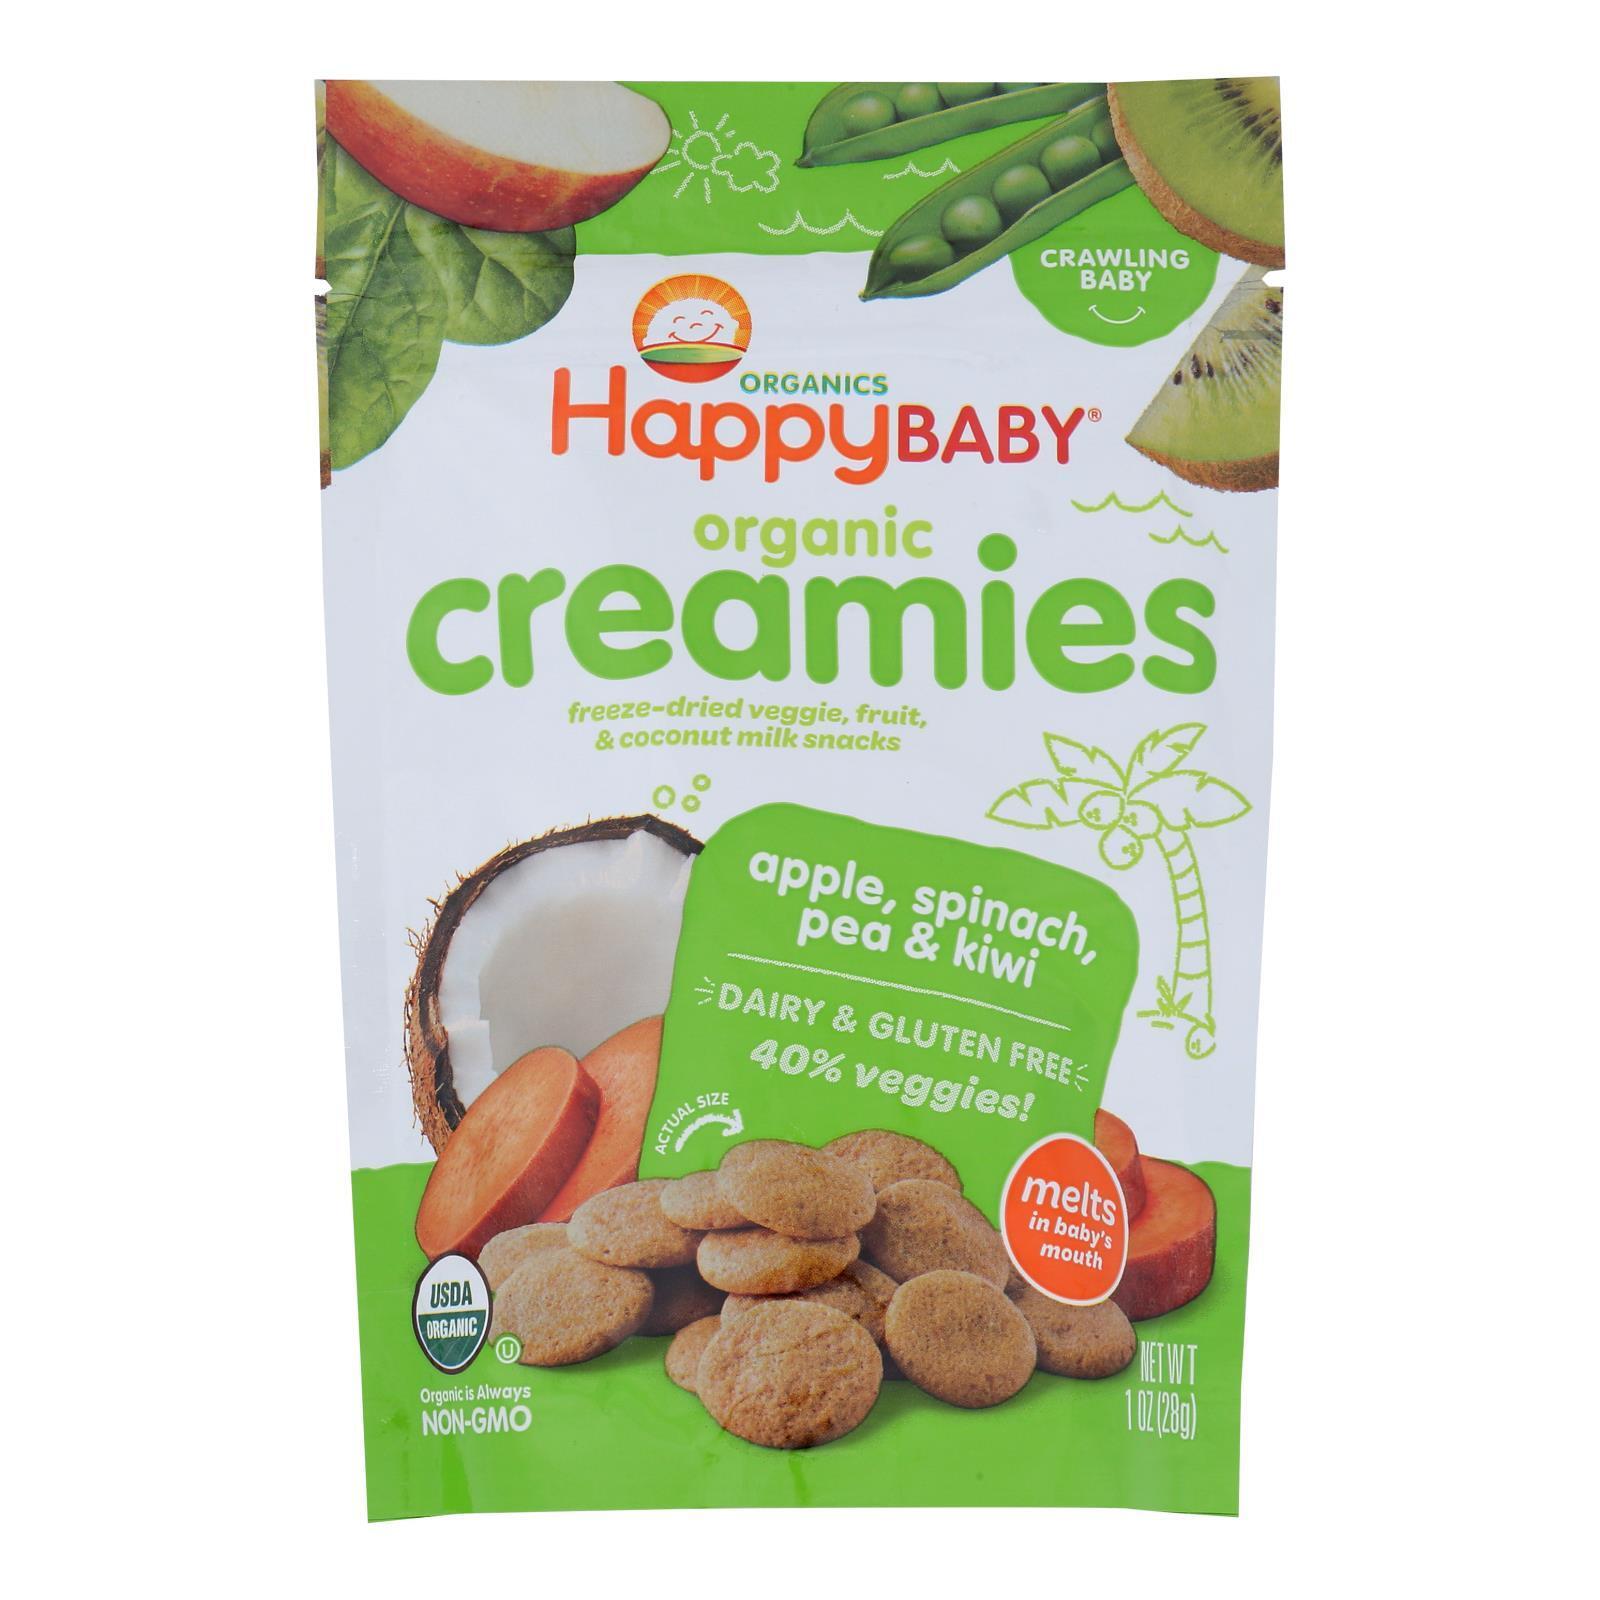 Happy Creamies Organic Snacks - Apple Spinach Pea Kiwi - Case of 8 - 1 oz